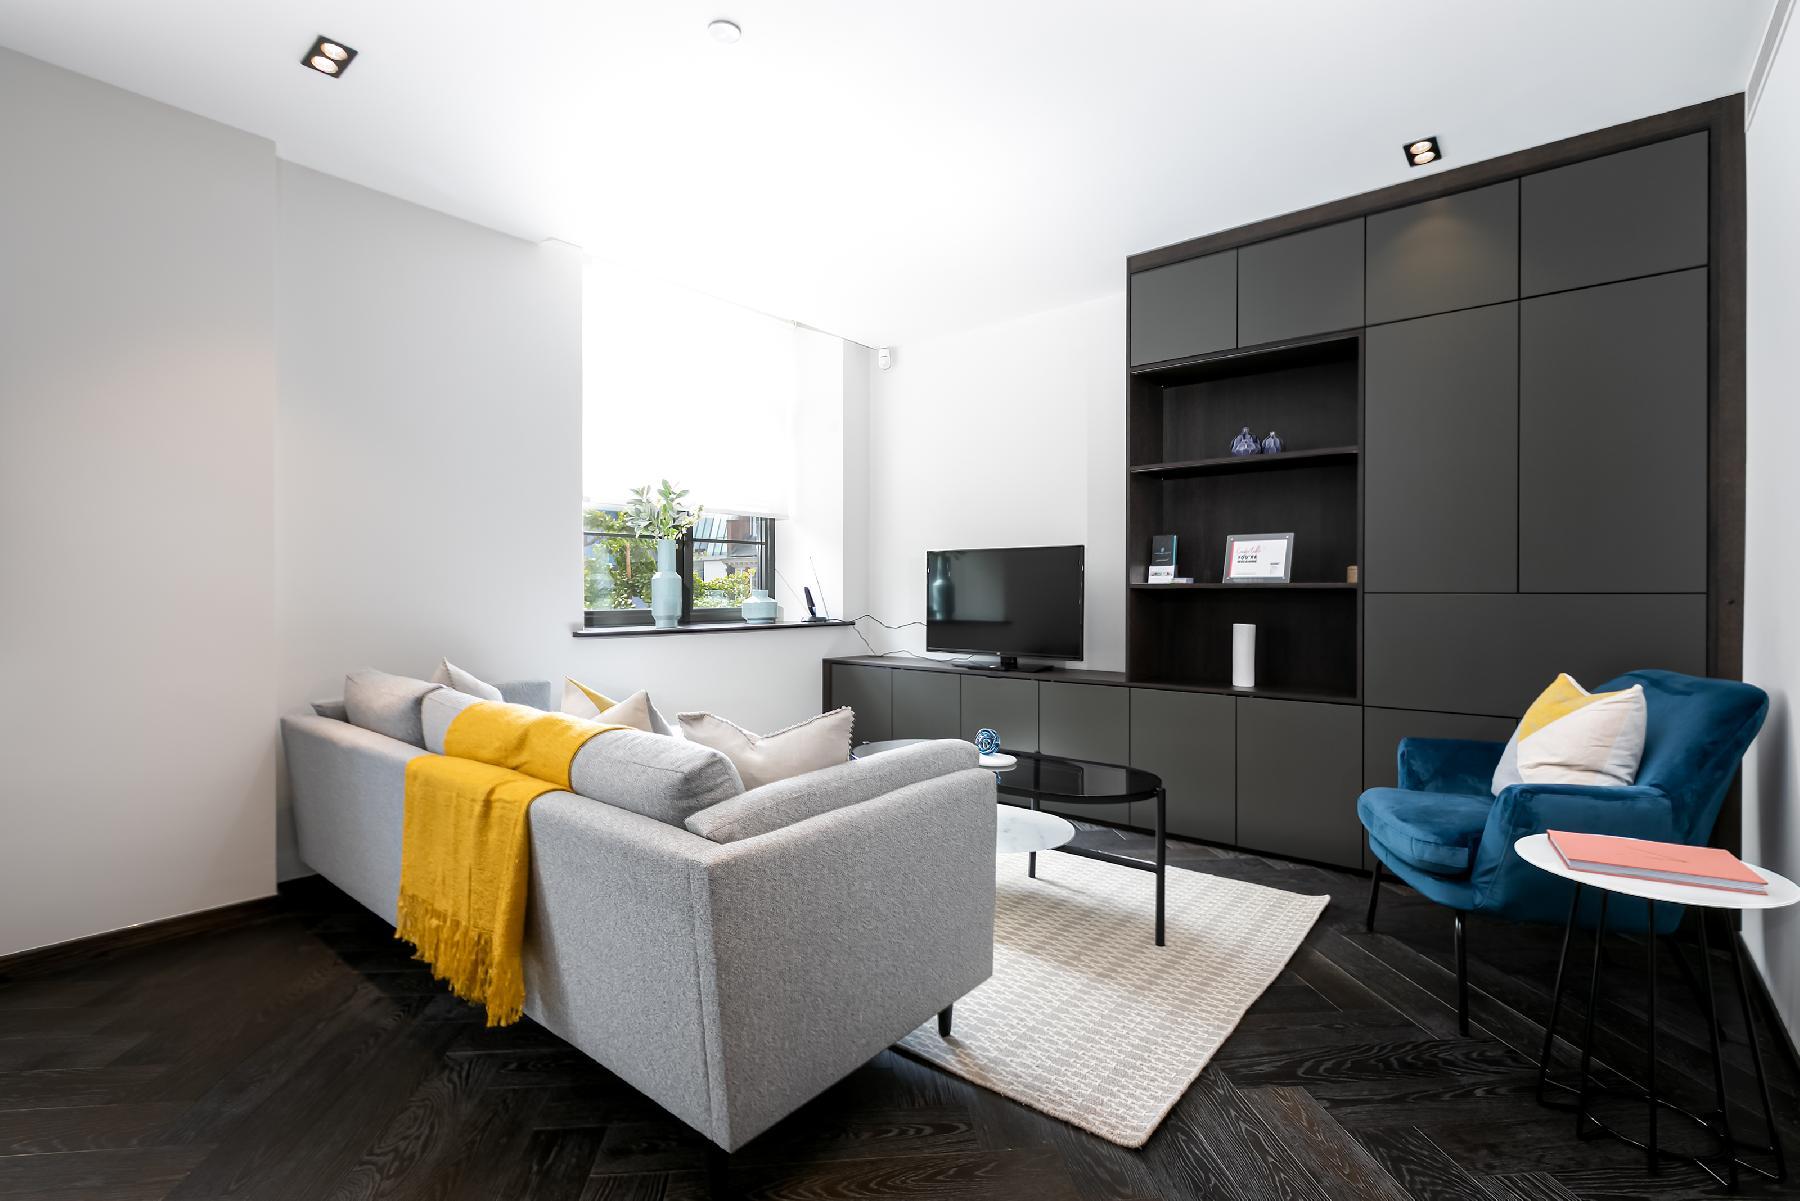 Oxford Street V, exceptional 1 bedroom flat by LOVELYDAYS